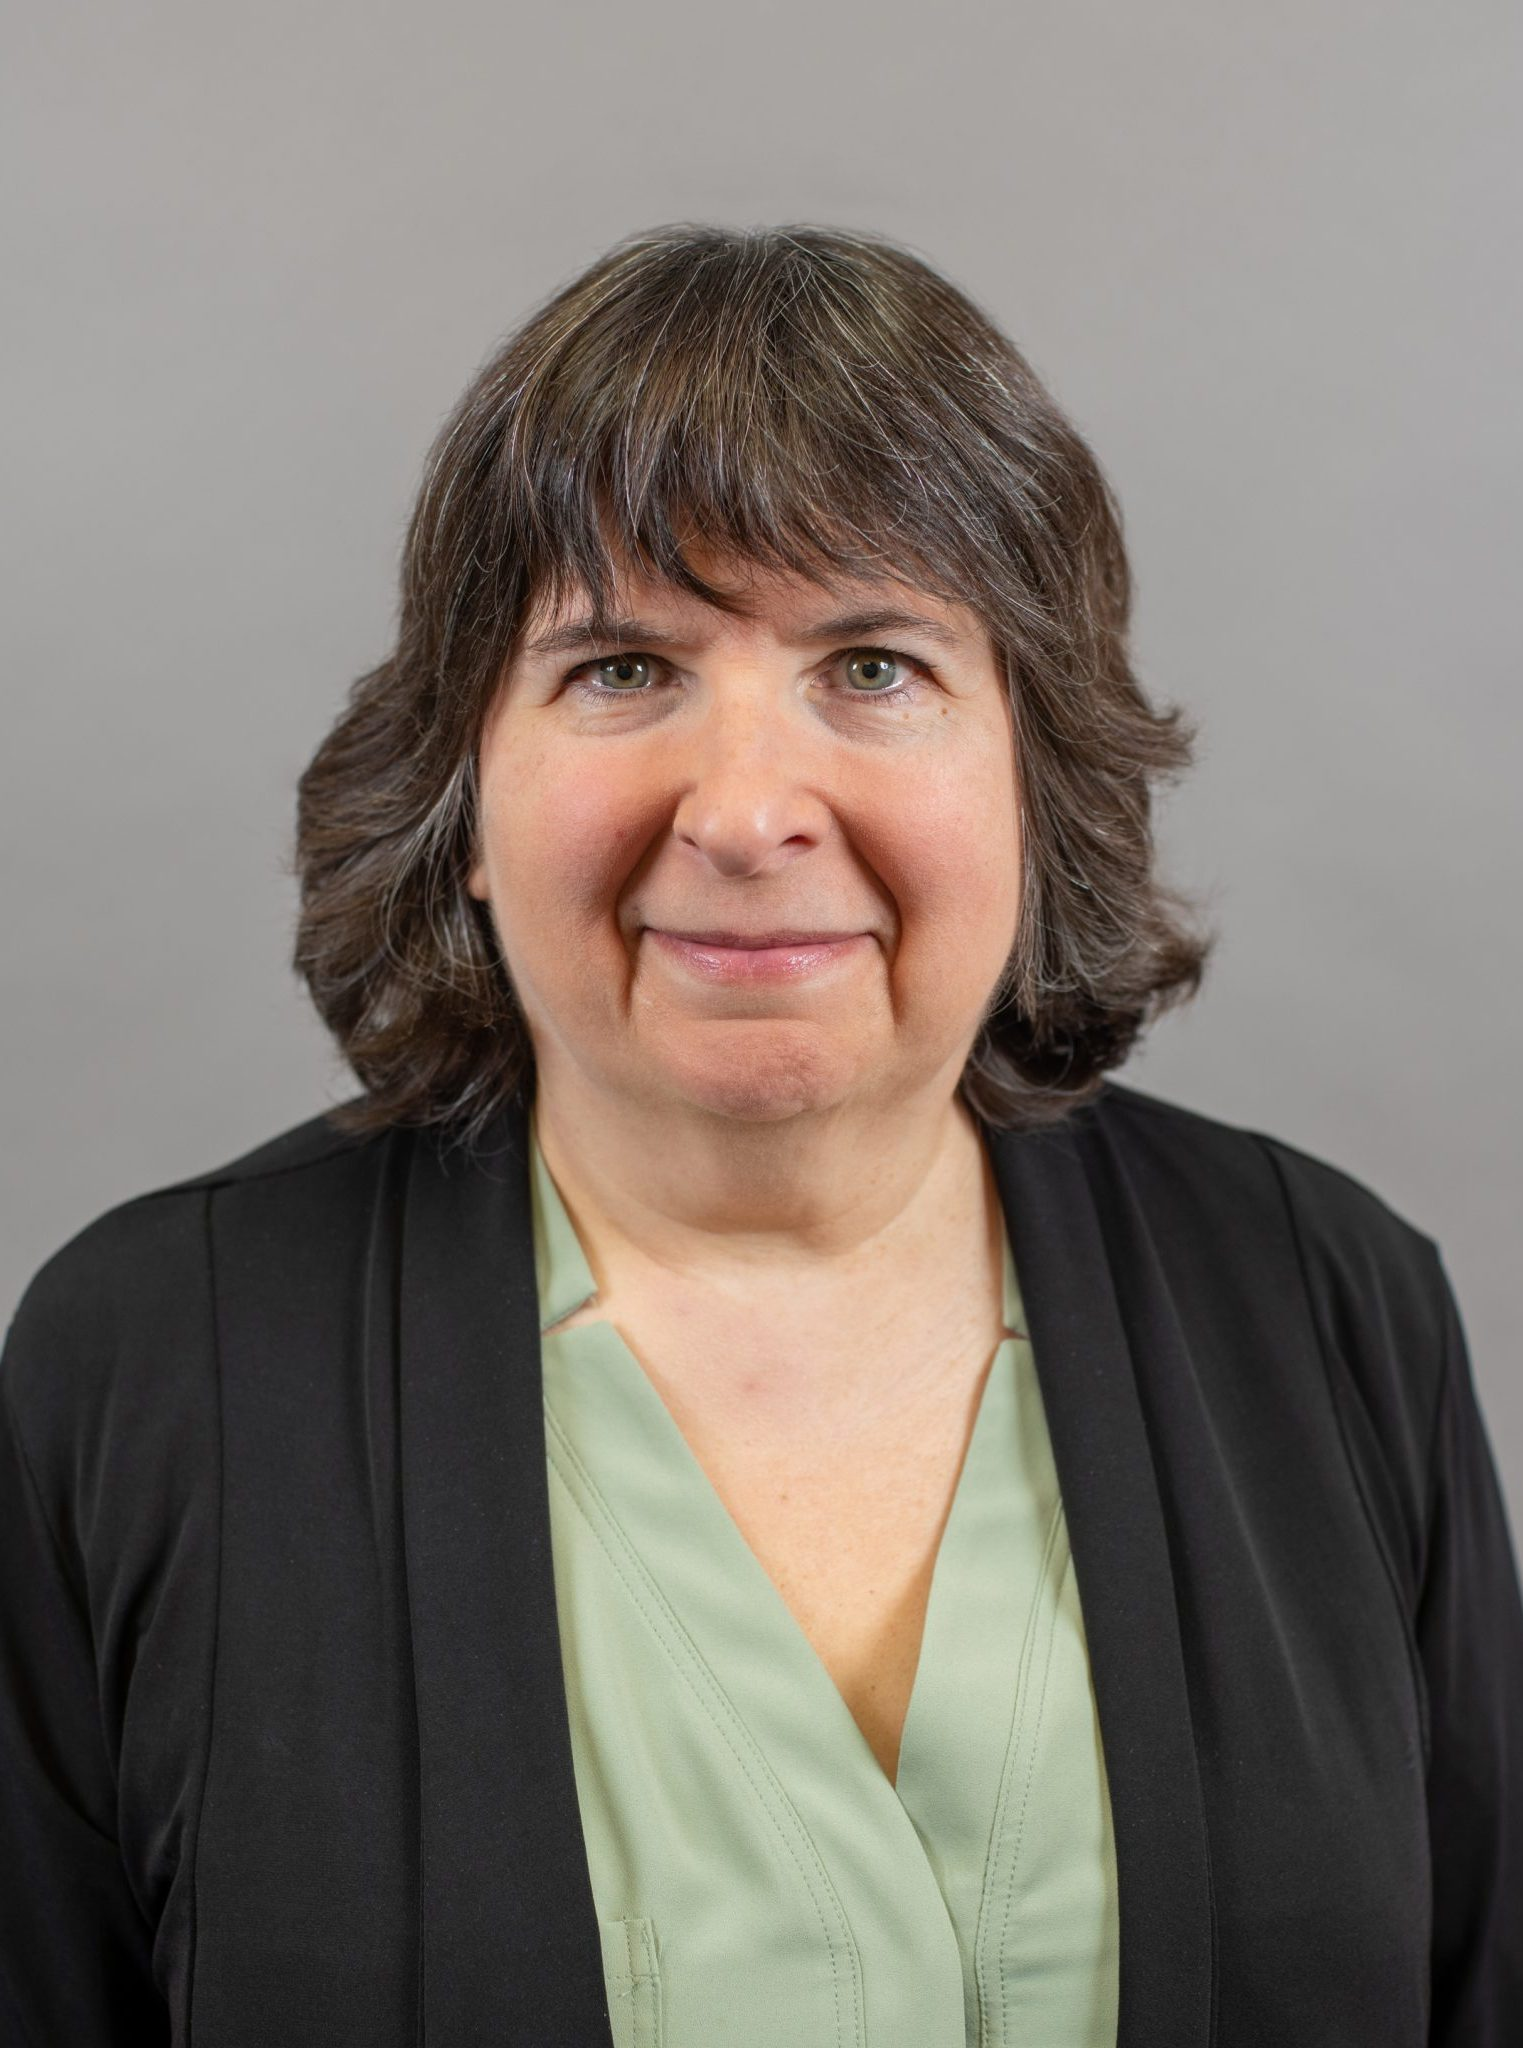 Headshot of Debra Dzwonczyk